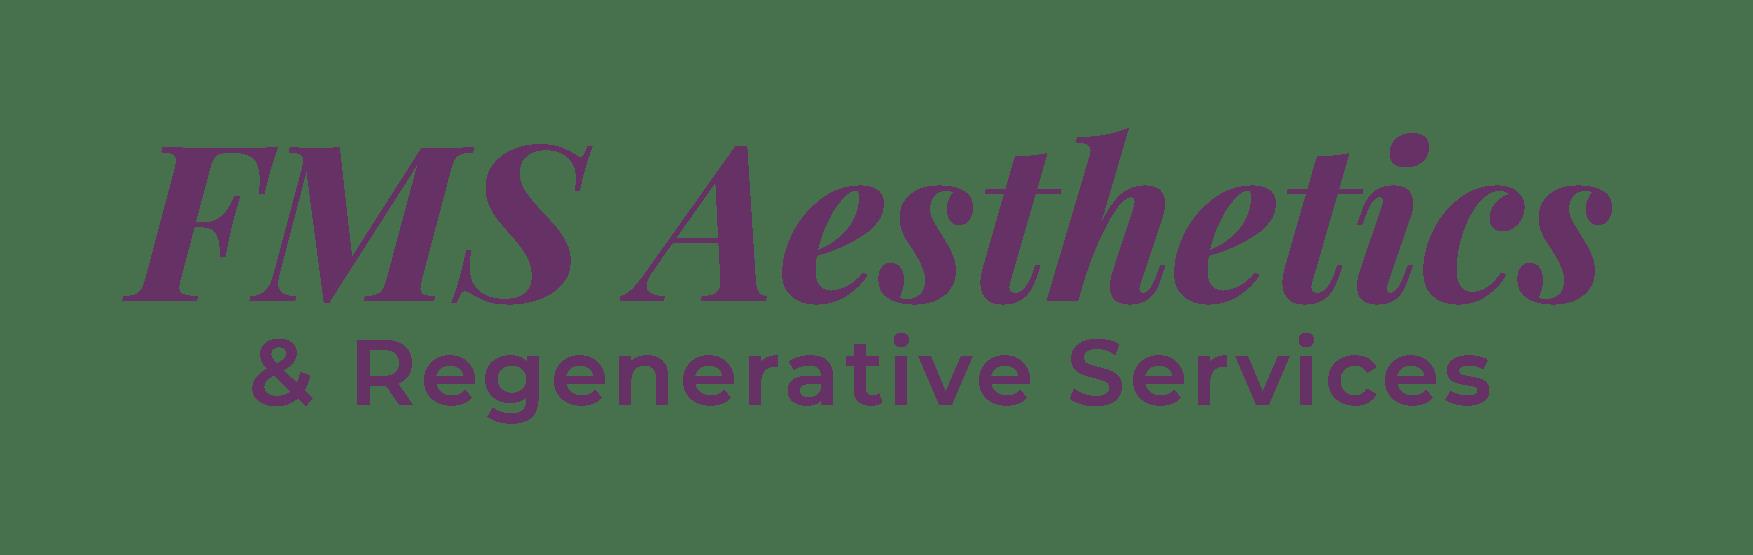 FMS Aesthetics